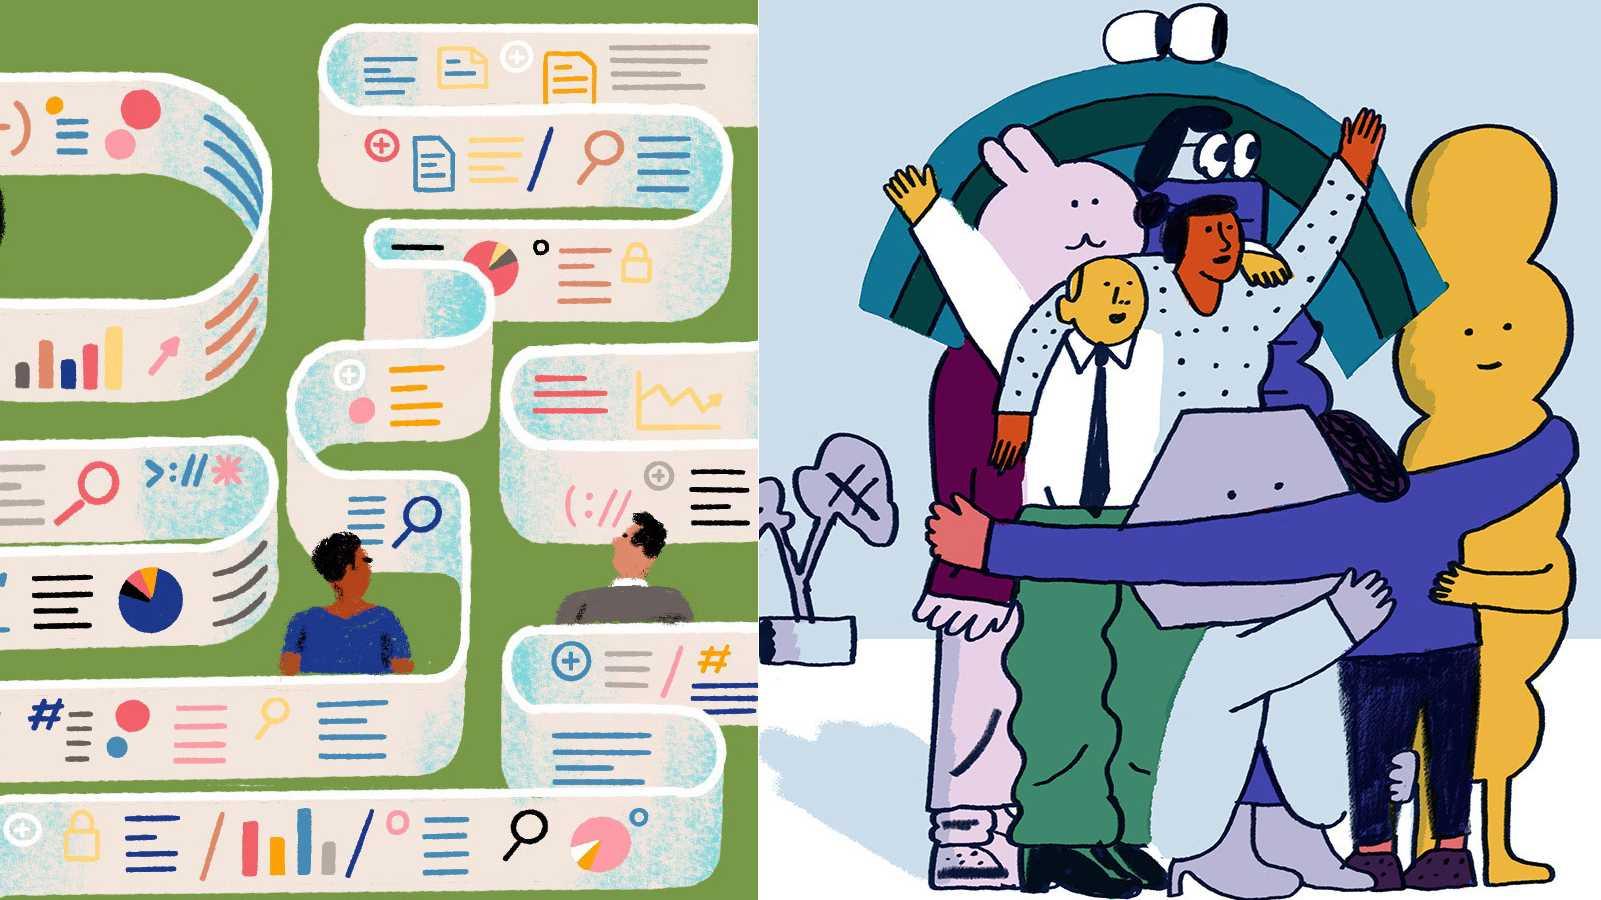 Messaging-Dienst Slack startet fulminant an der New Yorker Börse